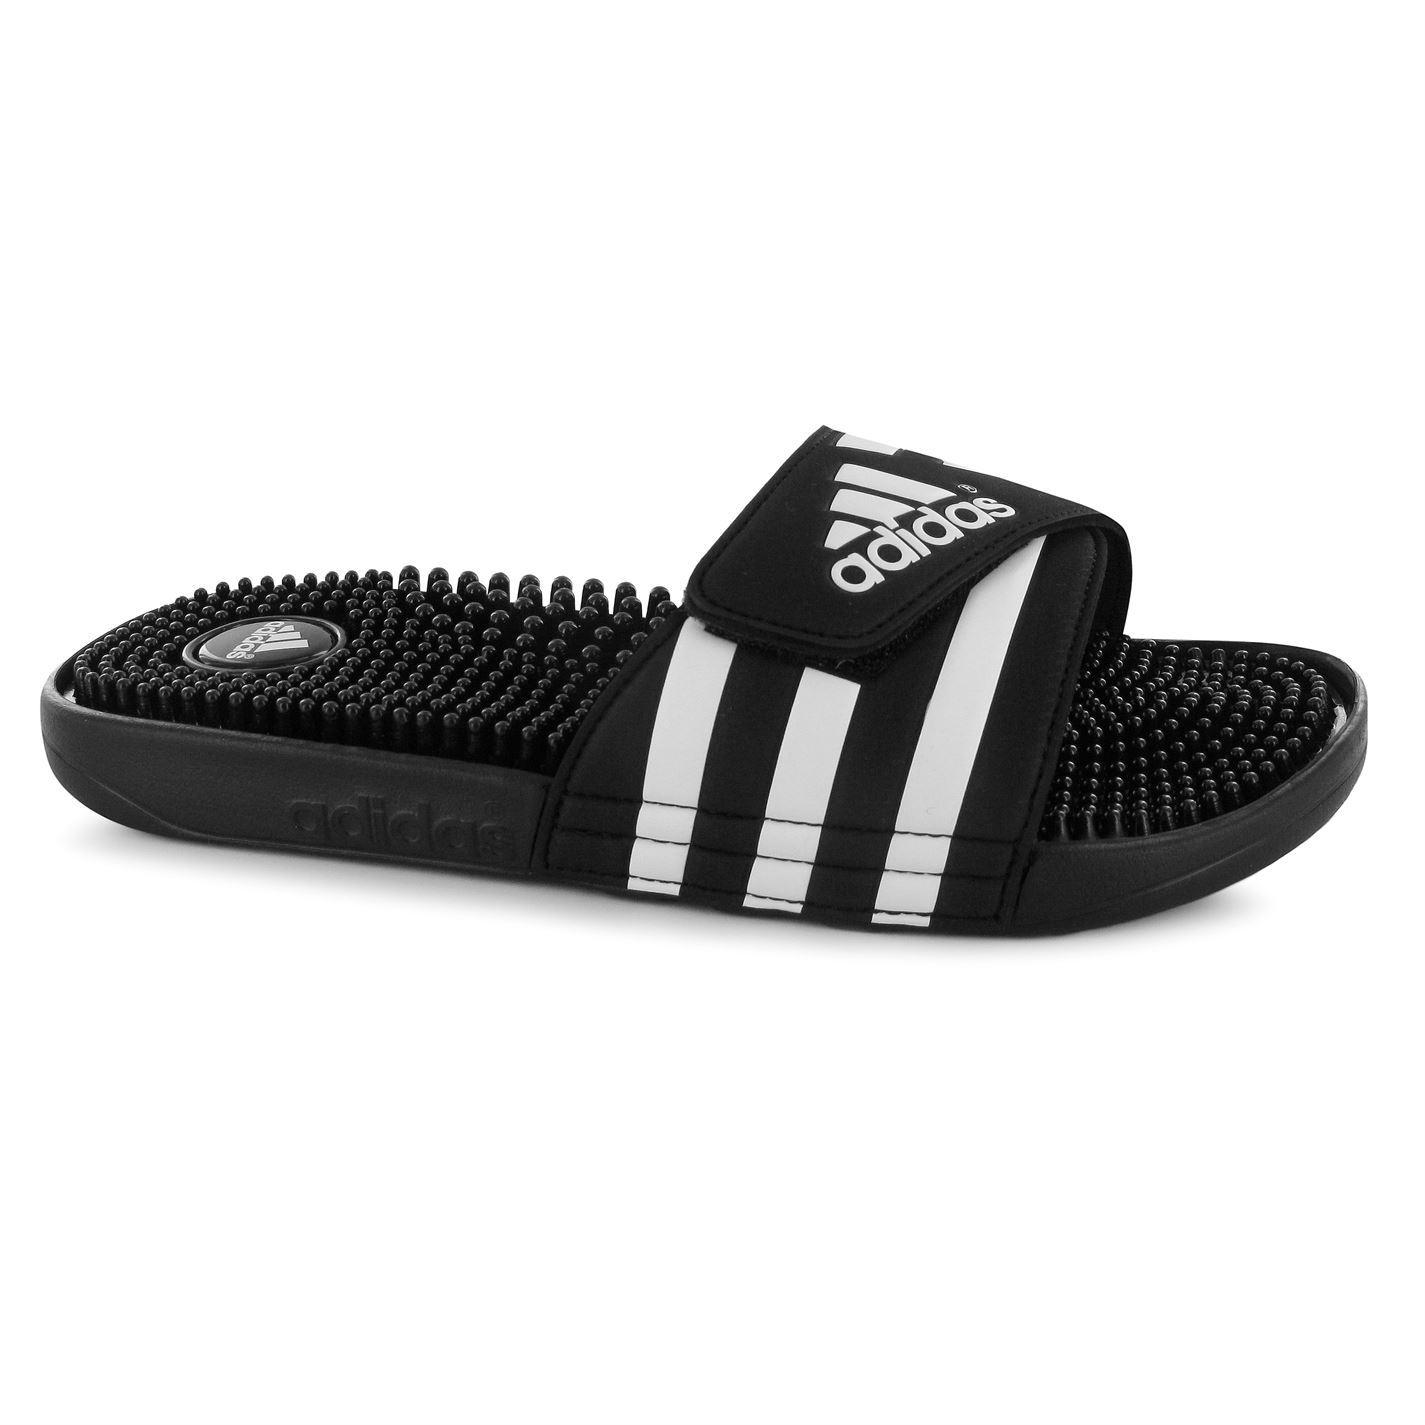 920e81388f0a38 ADIDAS MENS ADISSAGE Slides Sandals Massage Footbed Summer Shoes ...